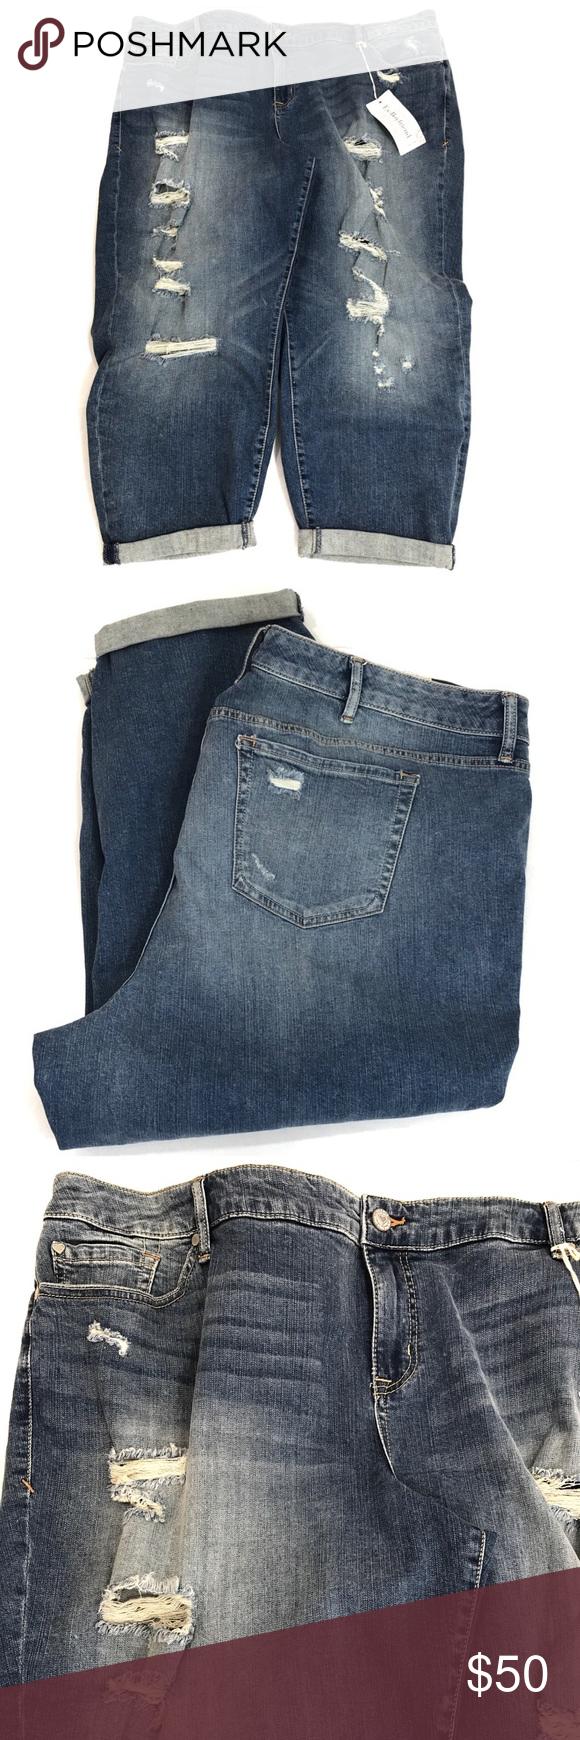 Torrid Distressed Ex Boyfriend Jeans Torrid Distressed Ex